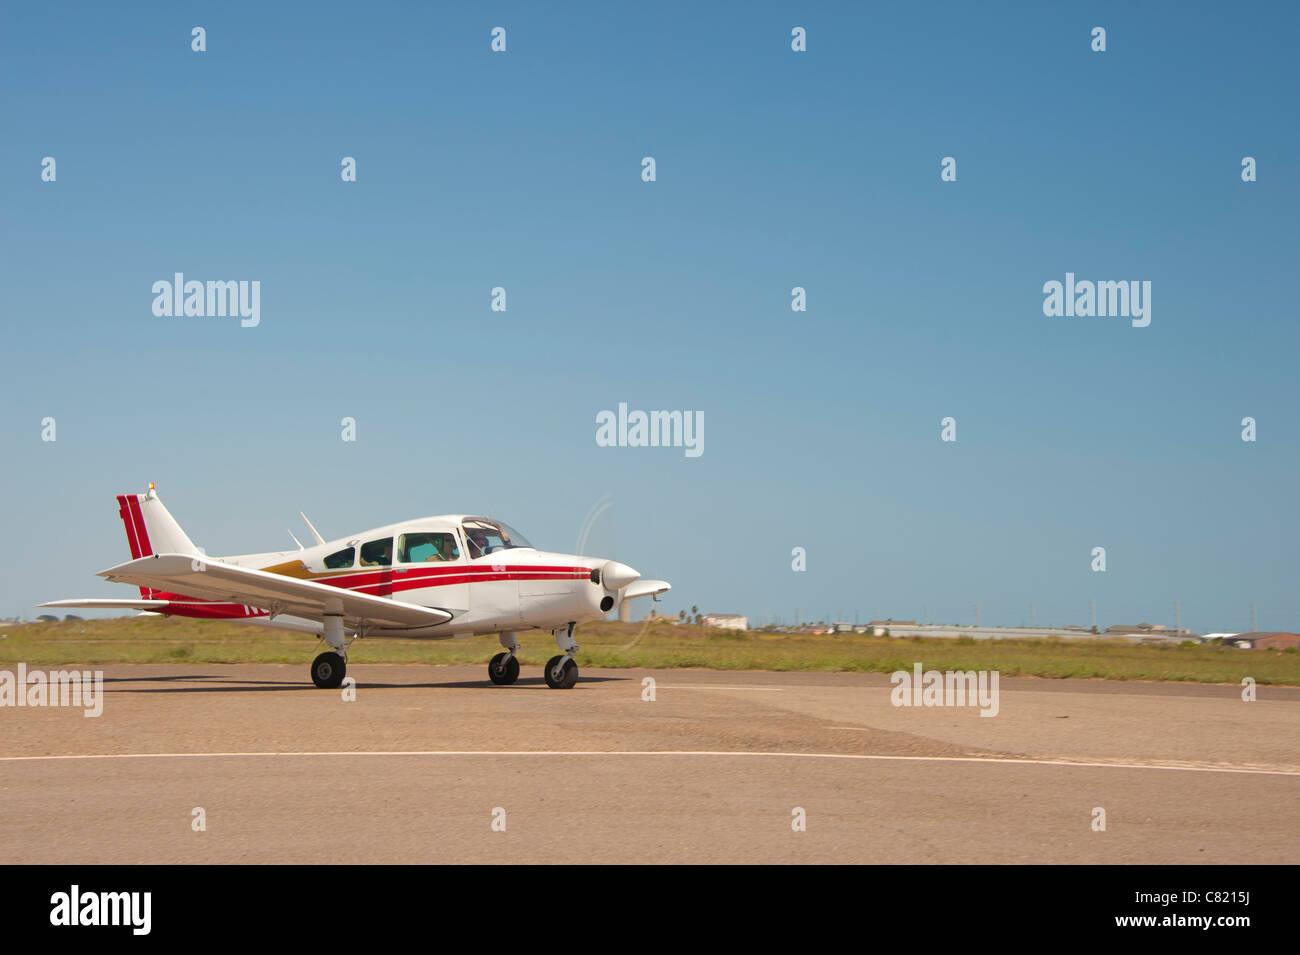 Hawker Beechcraft Airplane on landing field - Stock Image